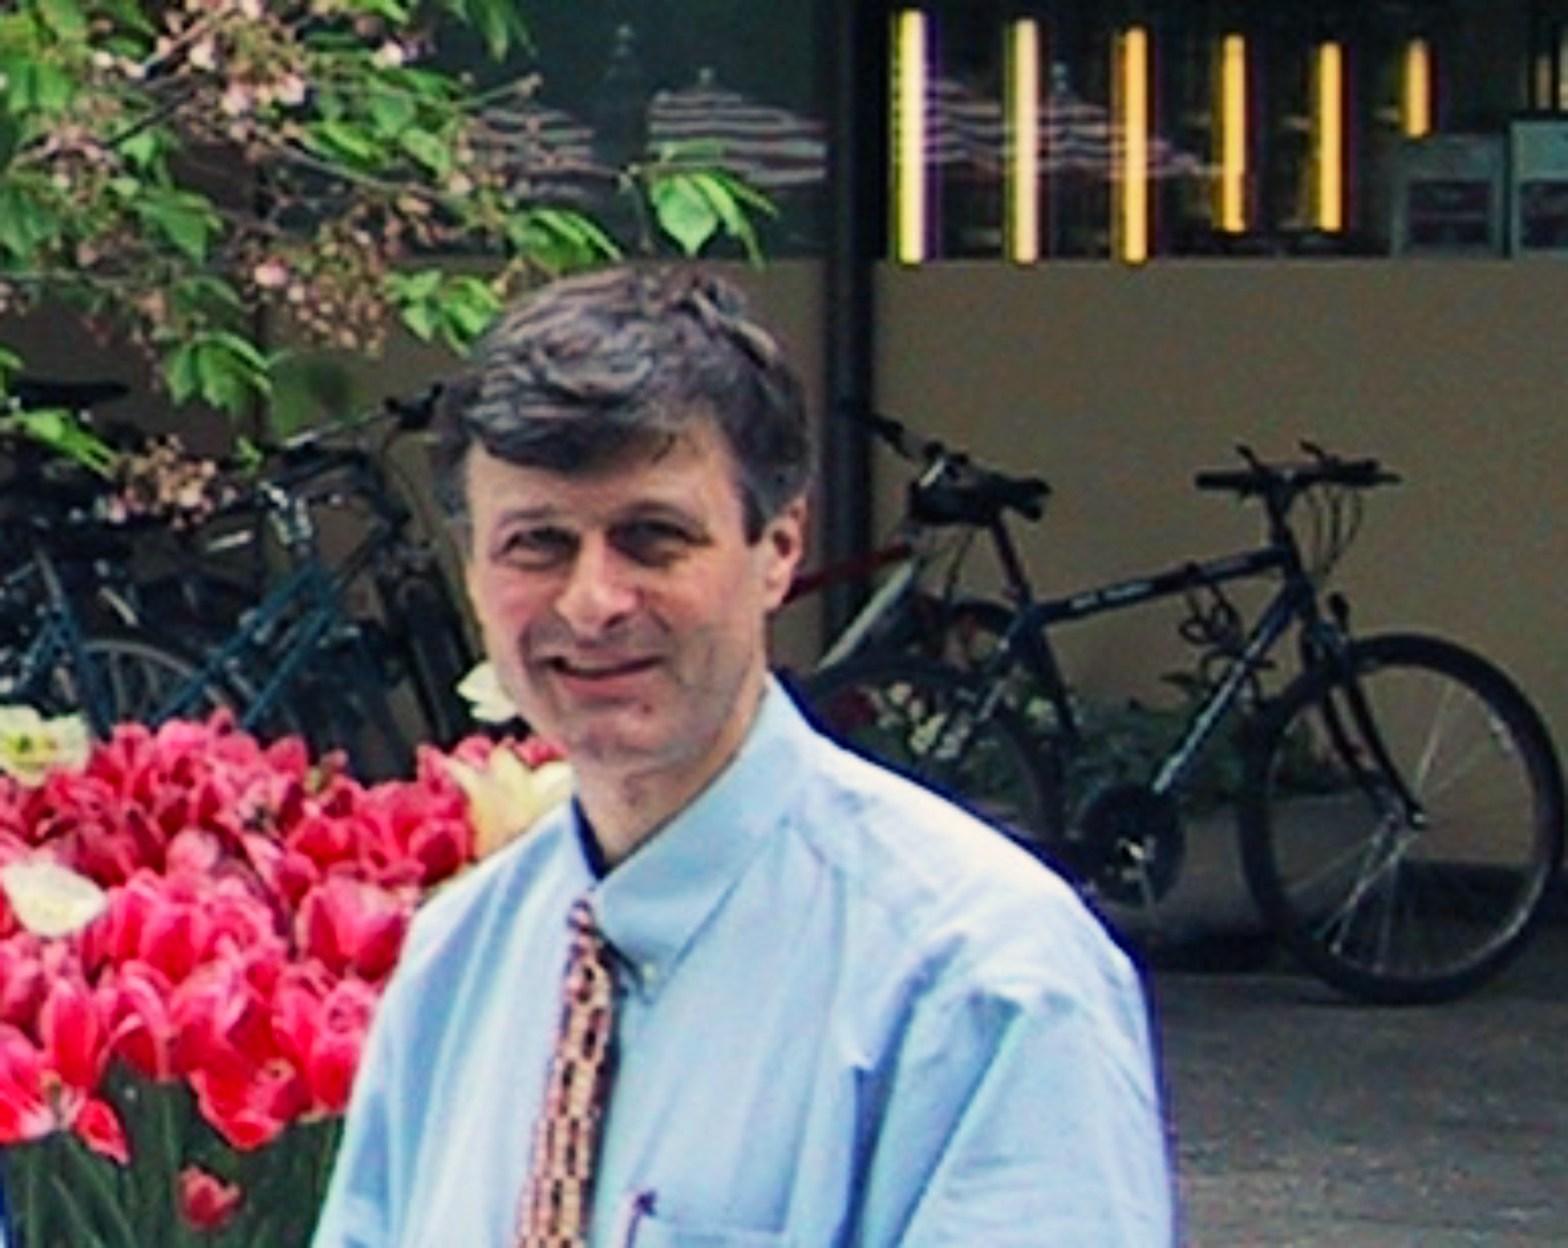 Gerhard Fasol talk at Stanford University